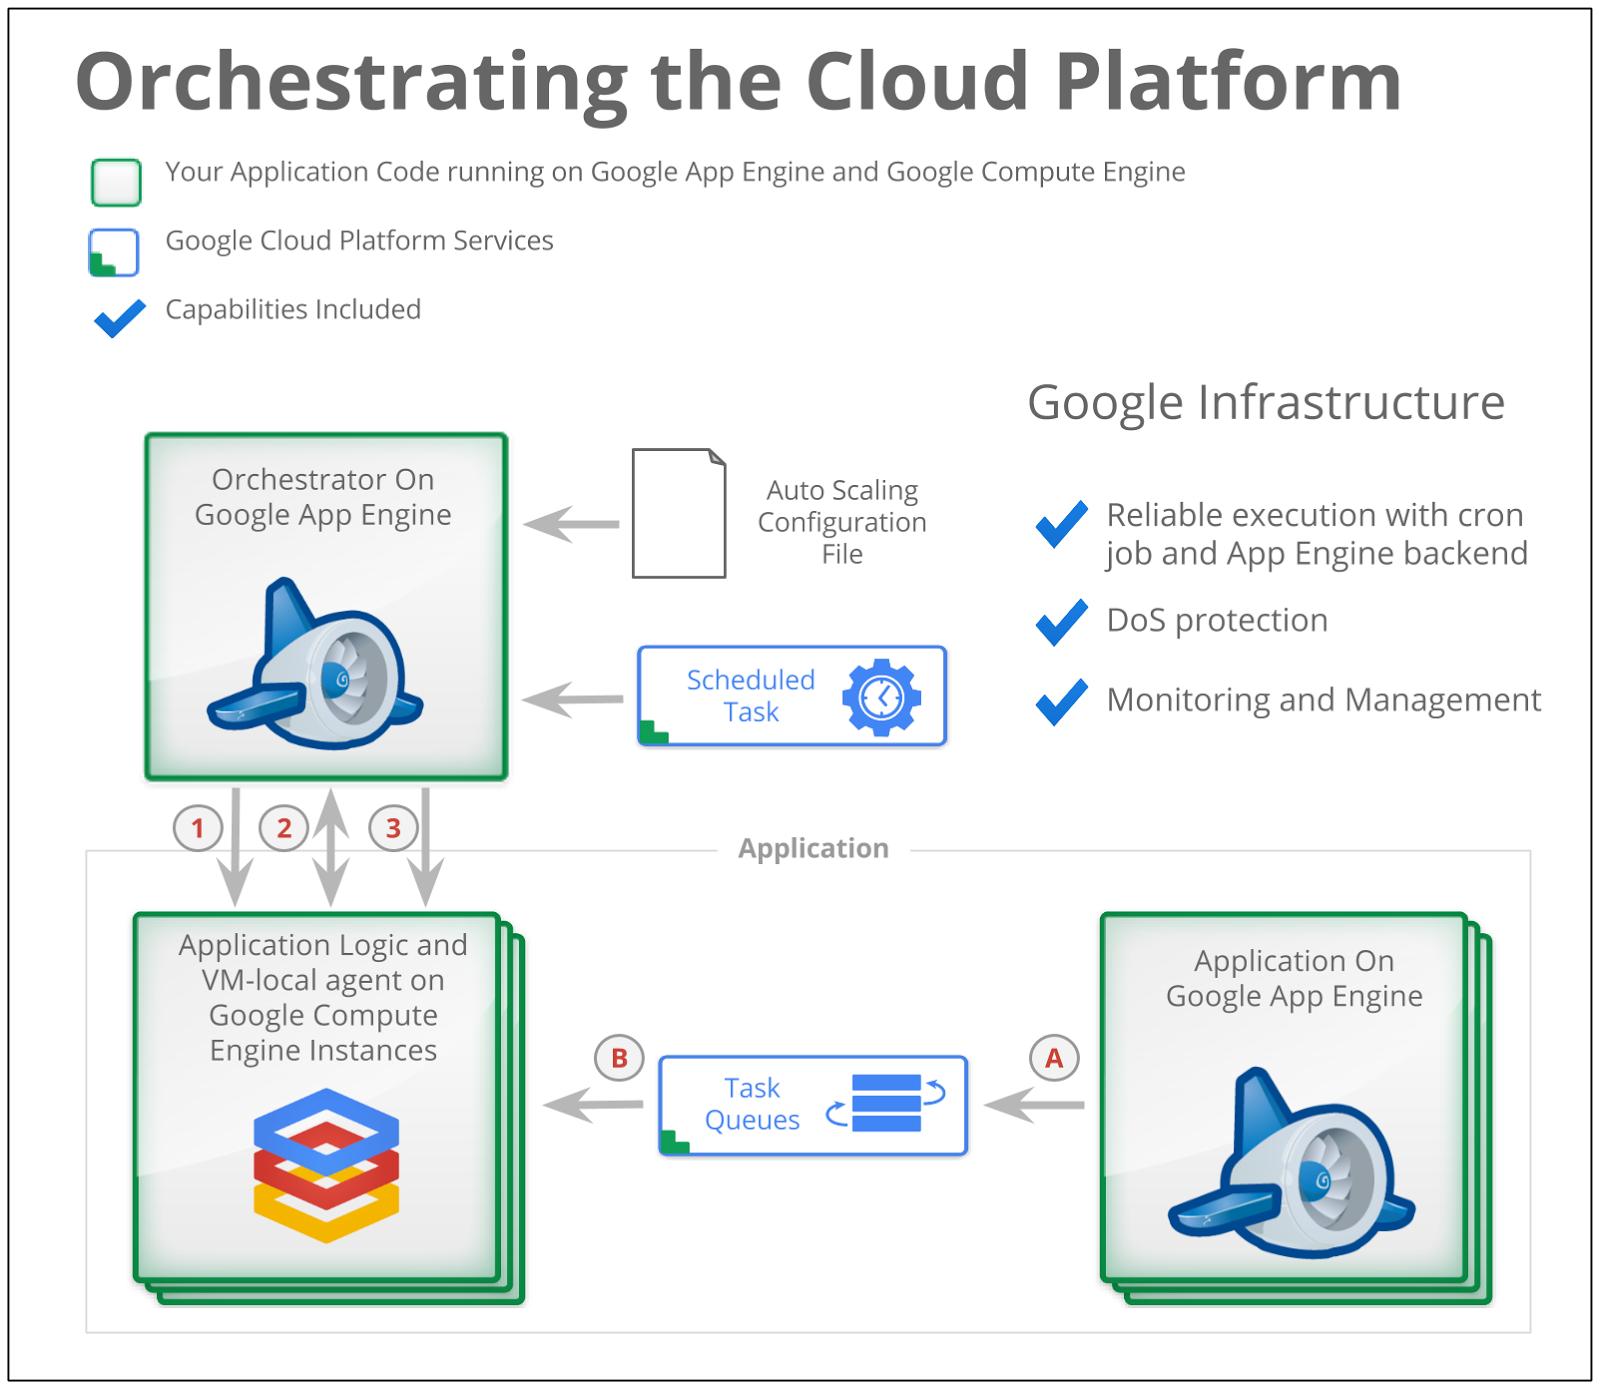 Google Cloud Platform Blog: How to get auto scaling of Google Compute Engine